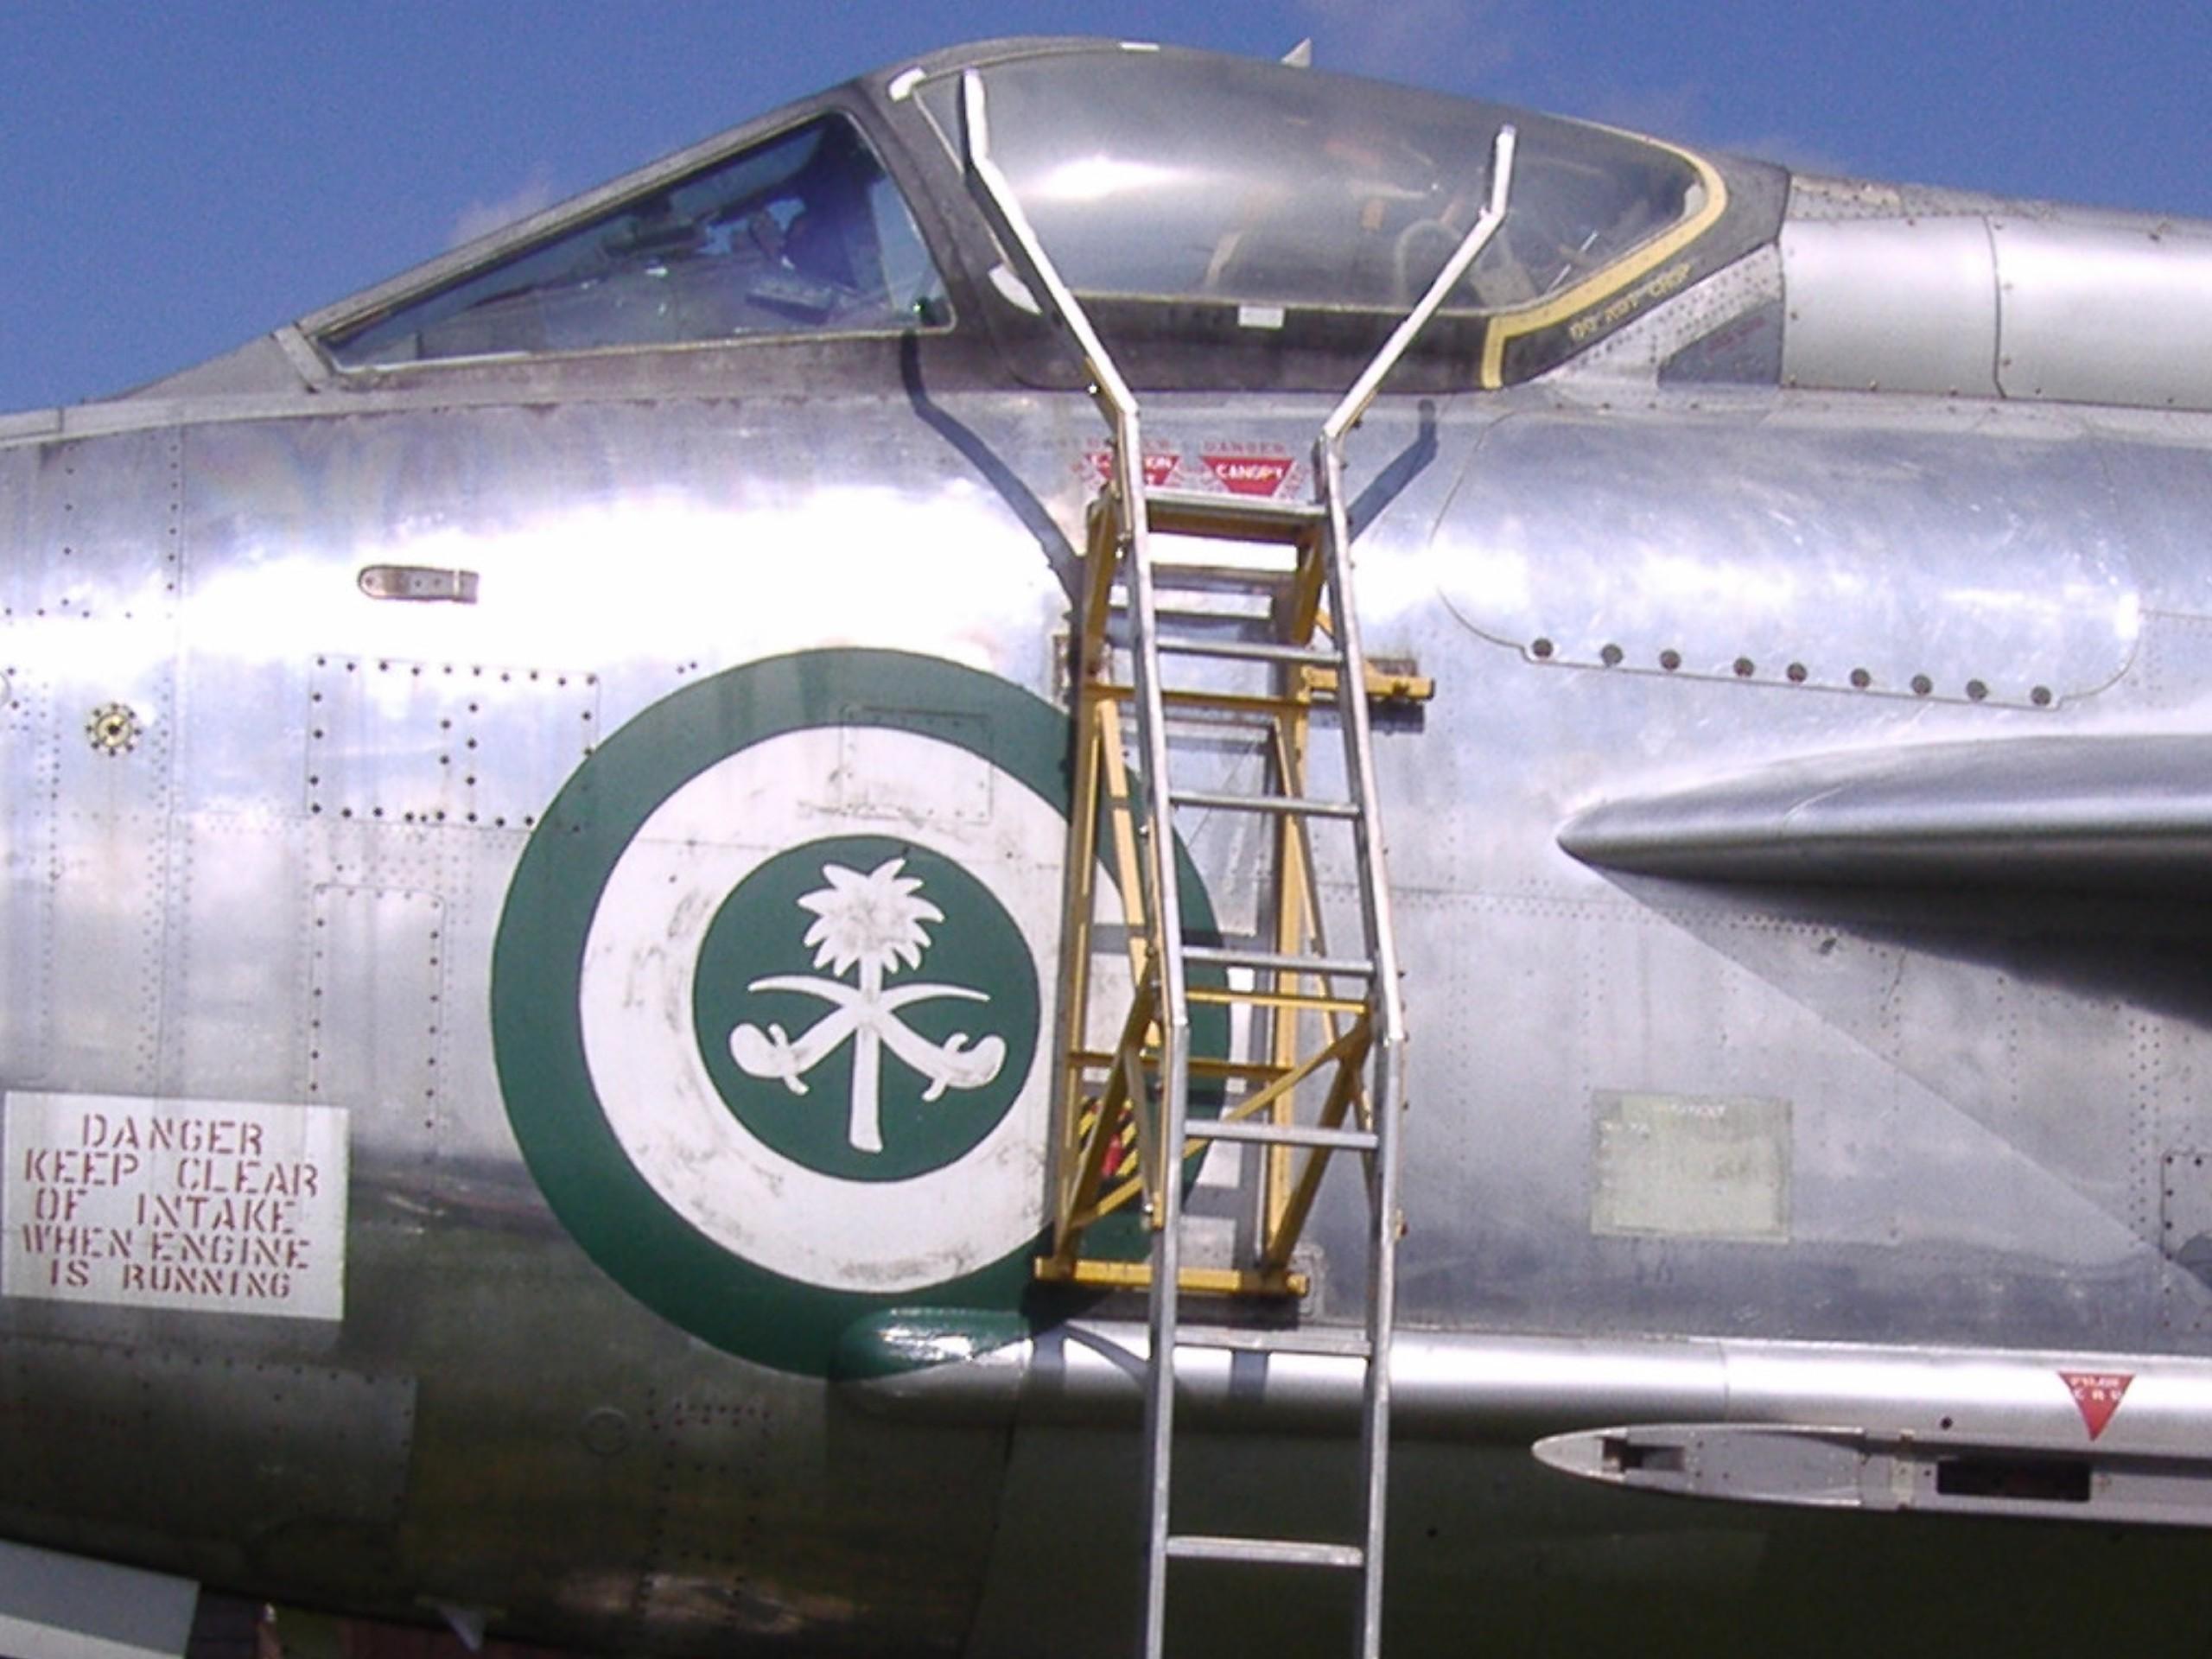 Military aircraft insignia - Wikipedia